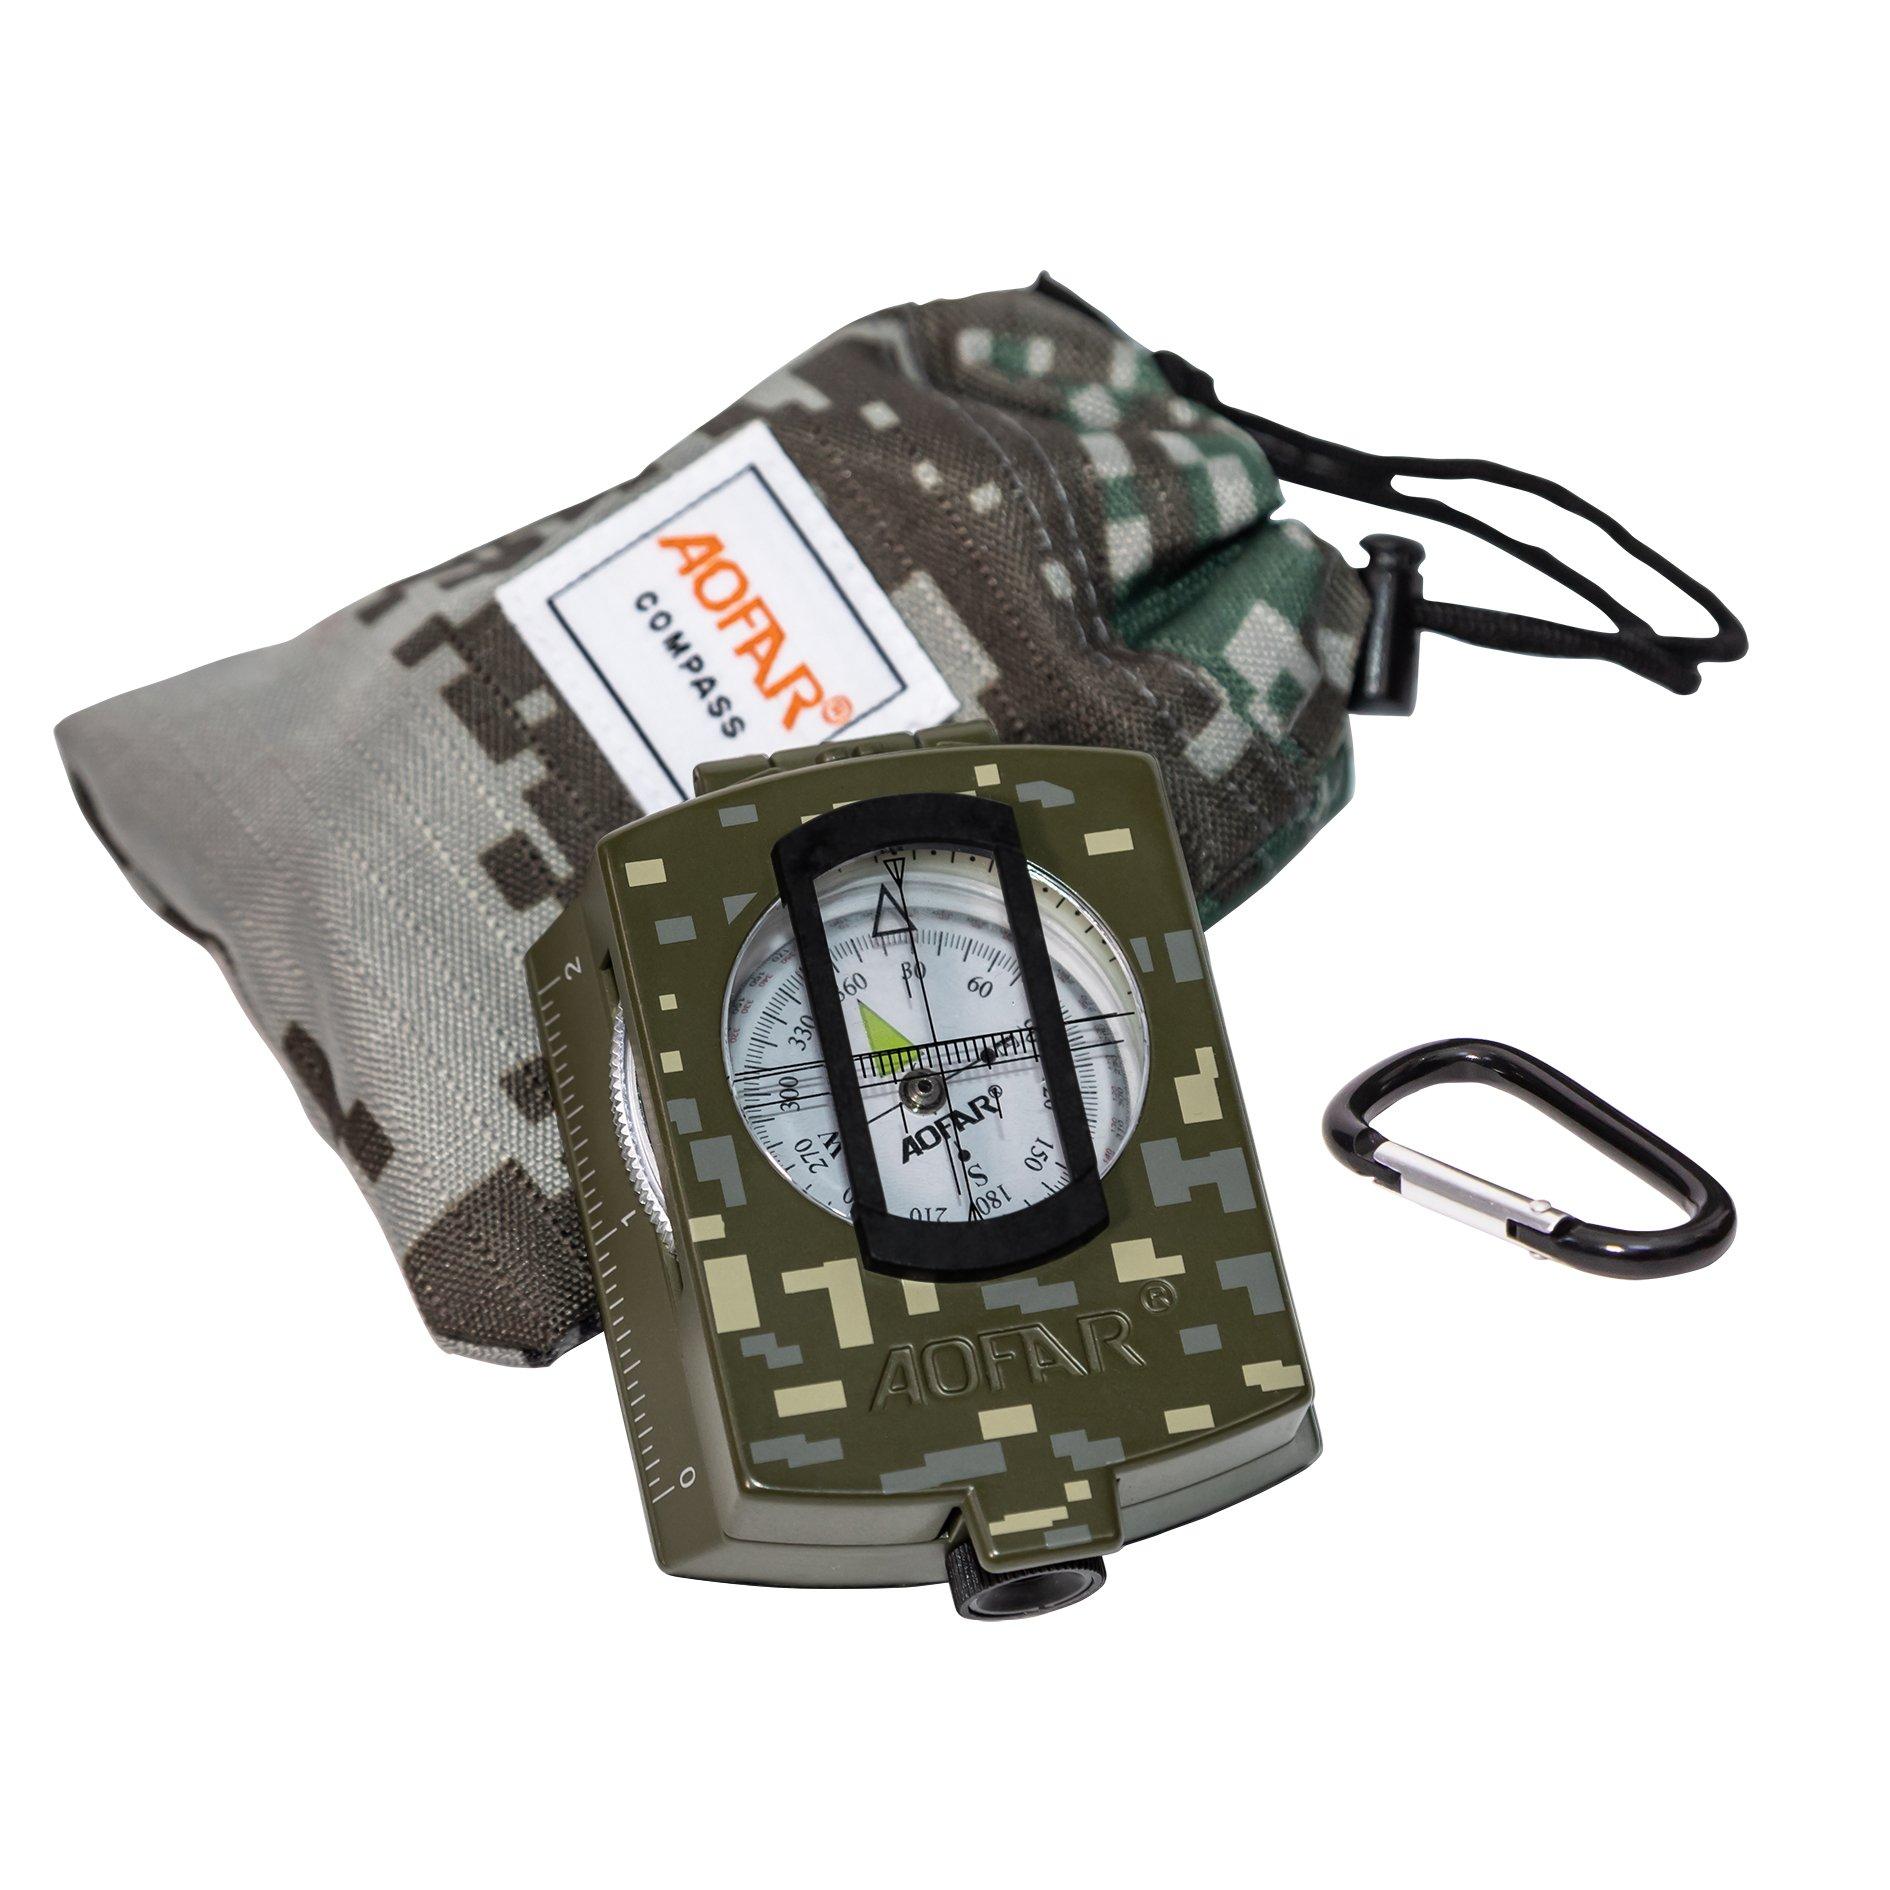 AOFAR Fluorescent Waterproof Shakeproof Backpacking